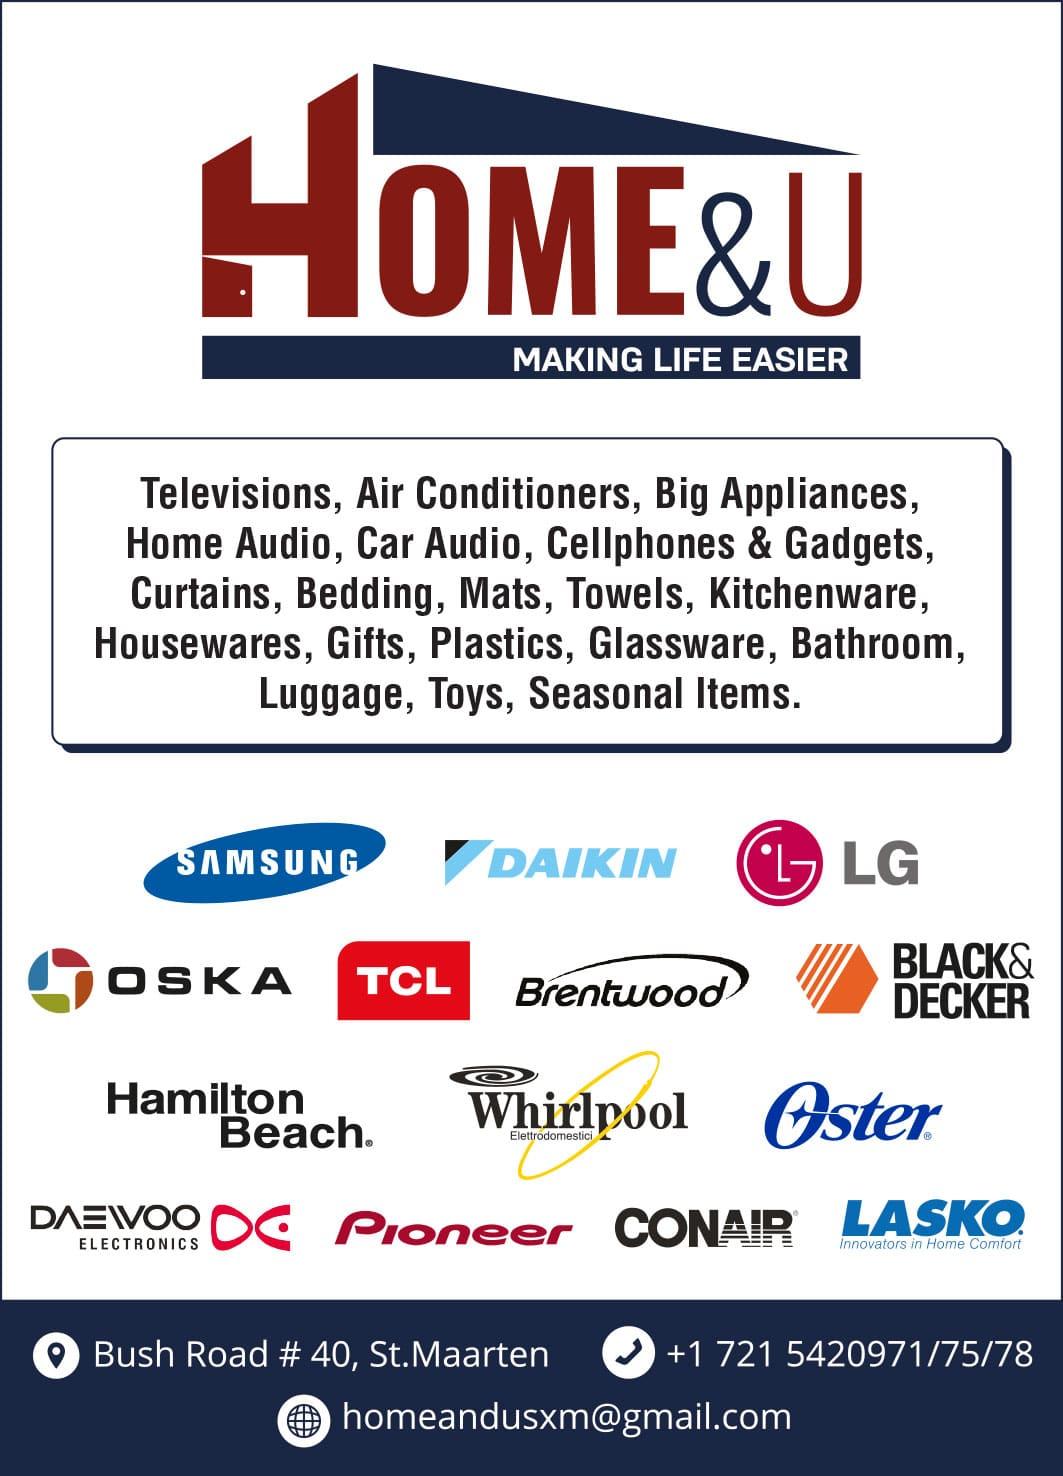 St Maarten Telephone Directory - Home and u